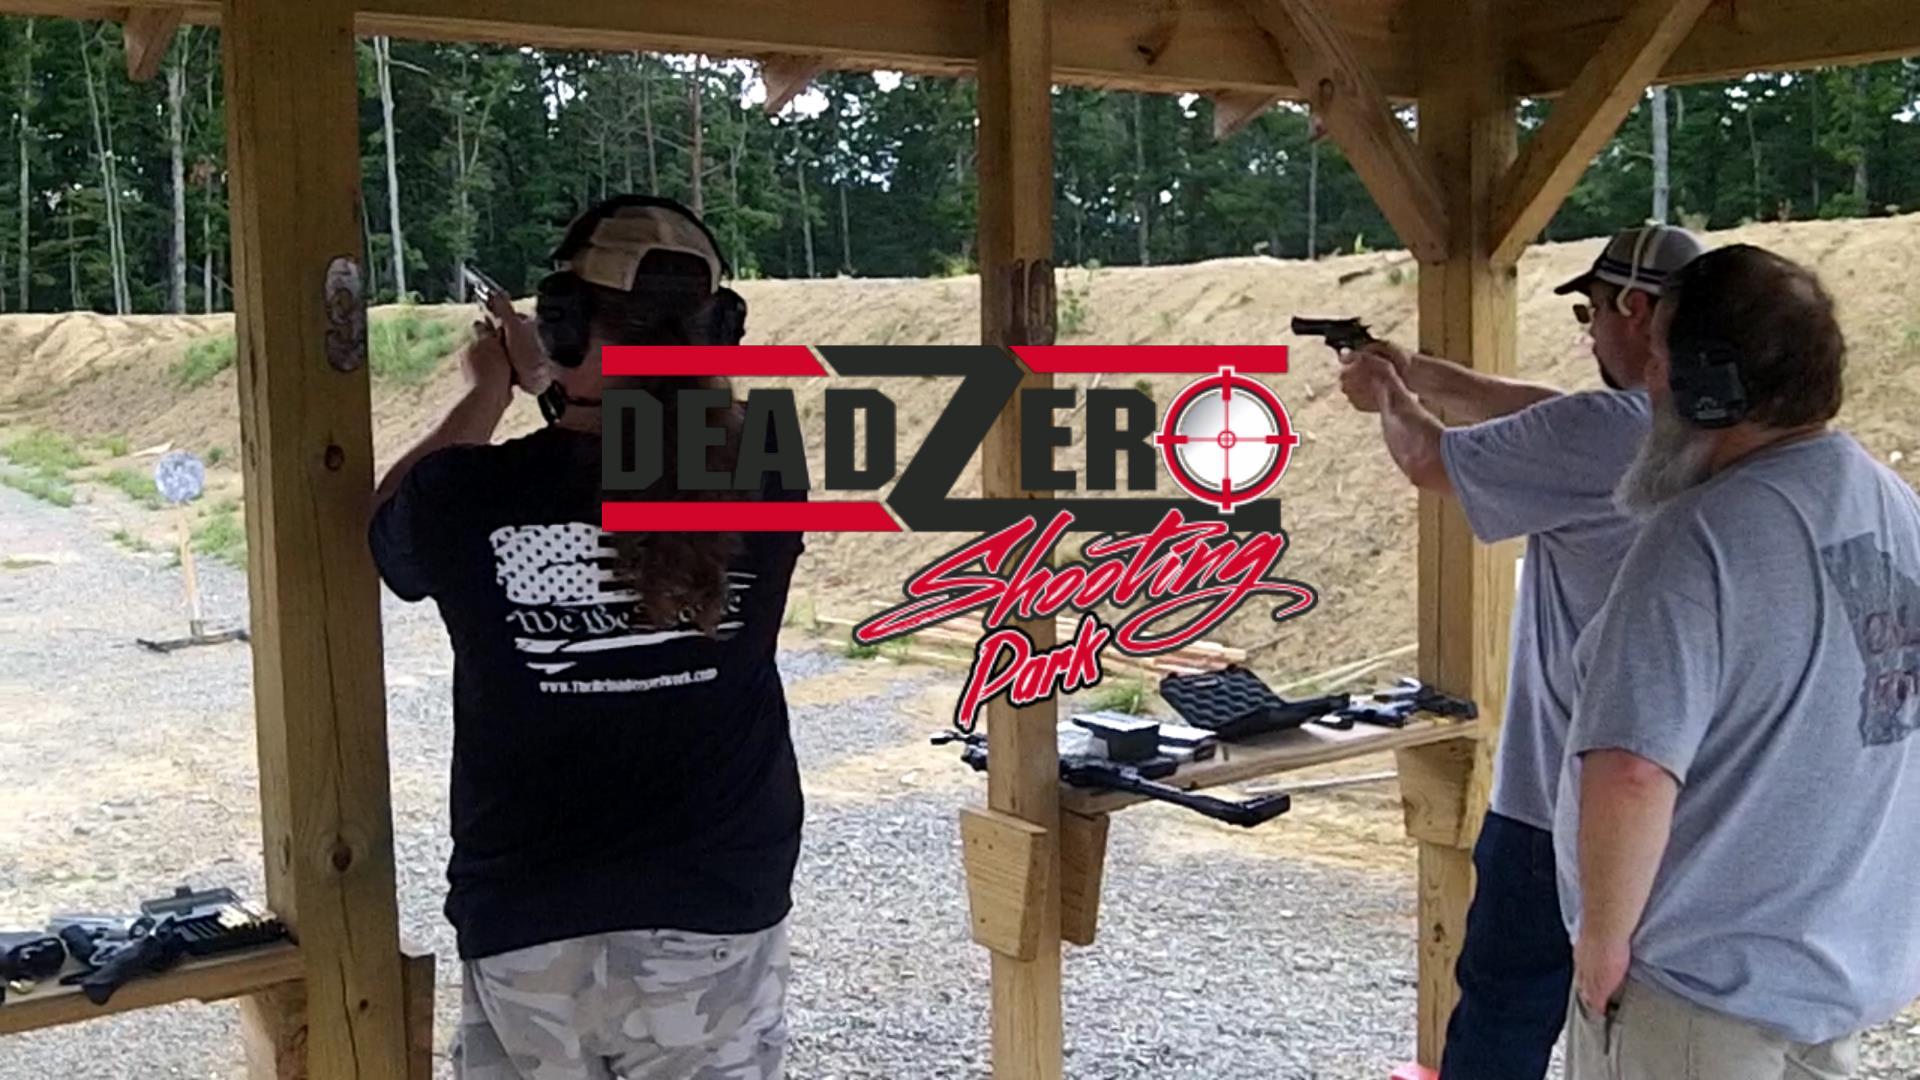 Dead Zero Shooting Park Day 2 6